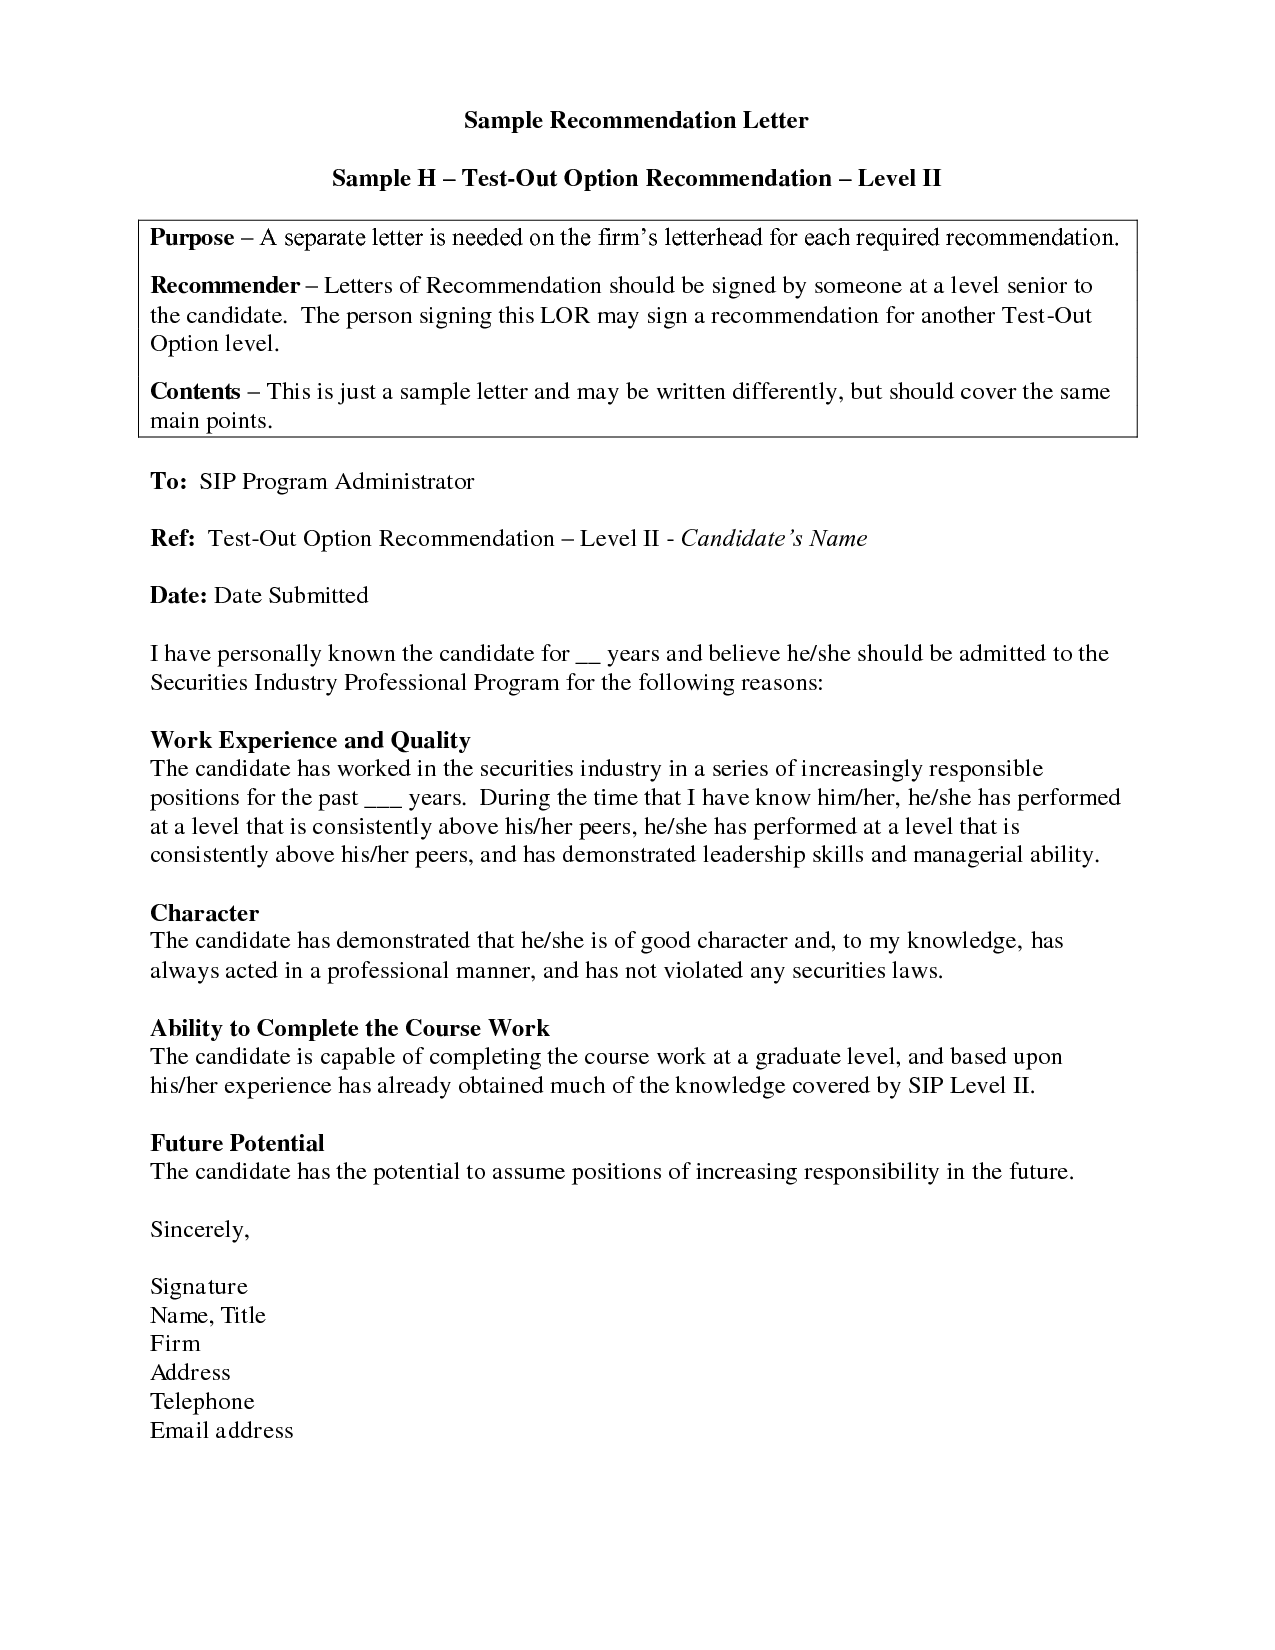 Sample Letter ExampleReference Letter